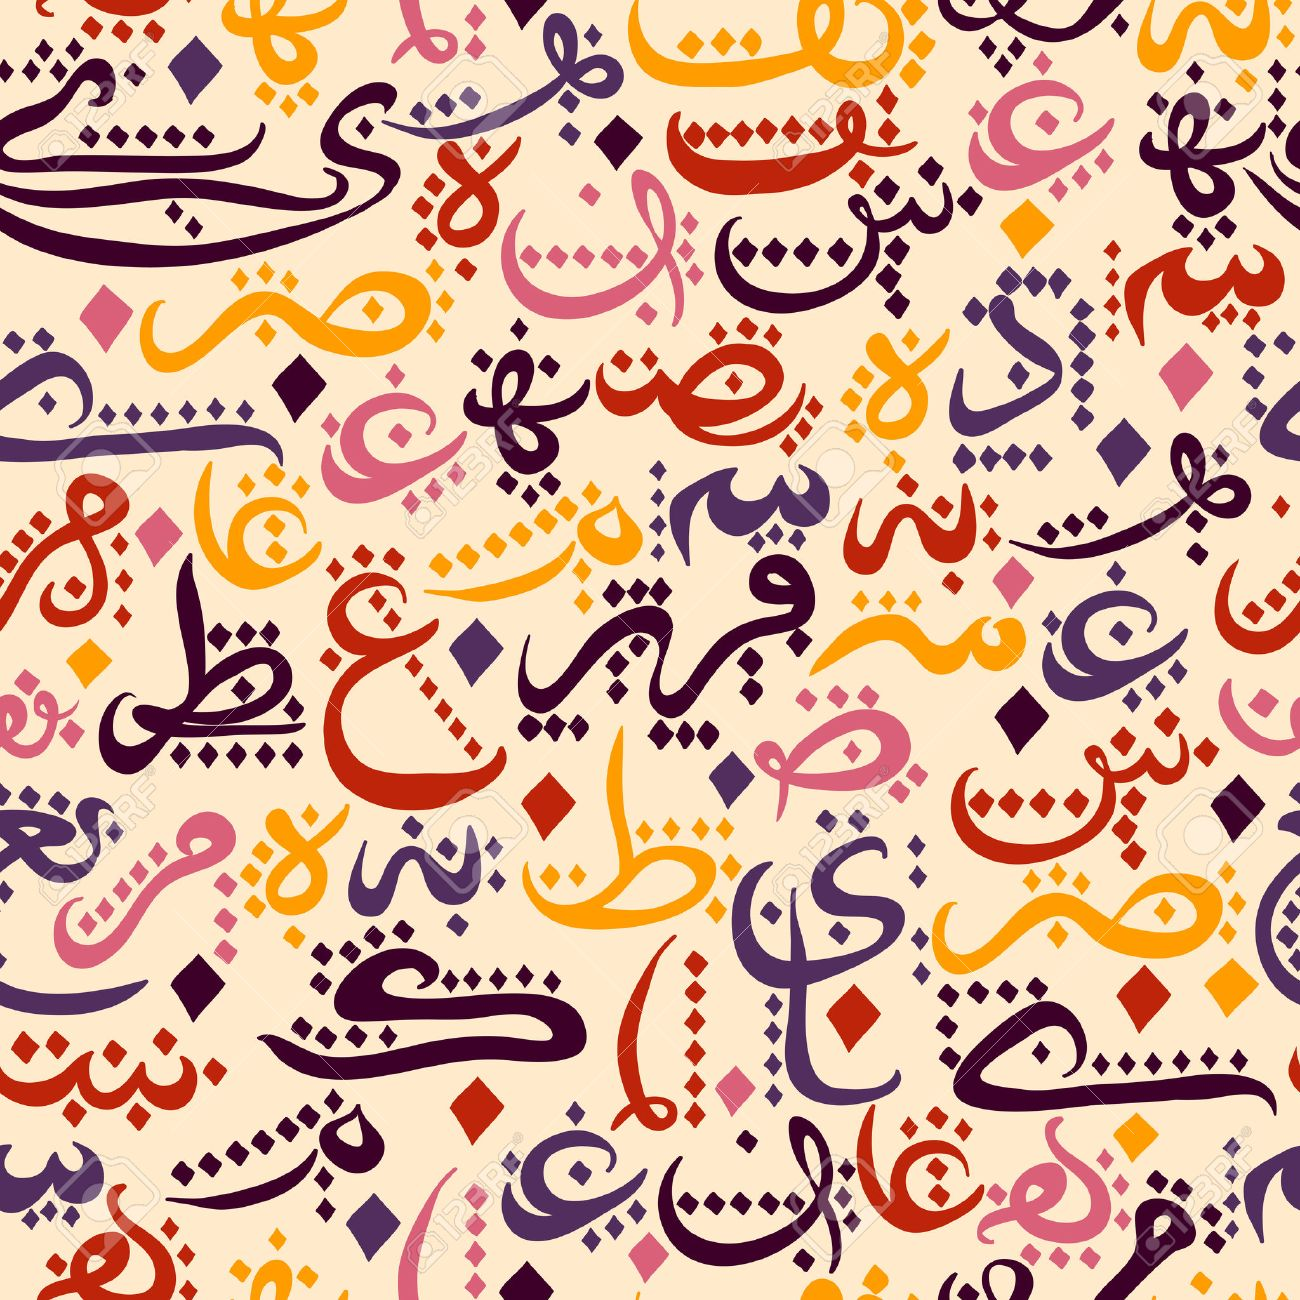 seamless pattern ornament Arabic calligraphy of text Eid Mubarak concept for muslim community festival Eid Al FitrEid Mubarak - 43922125